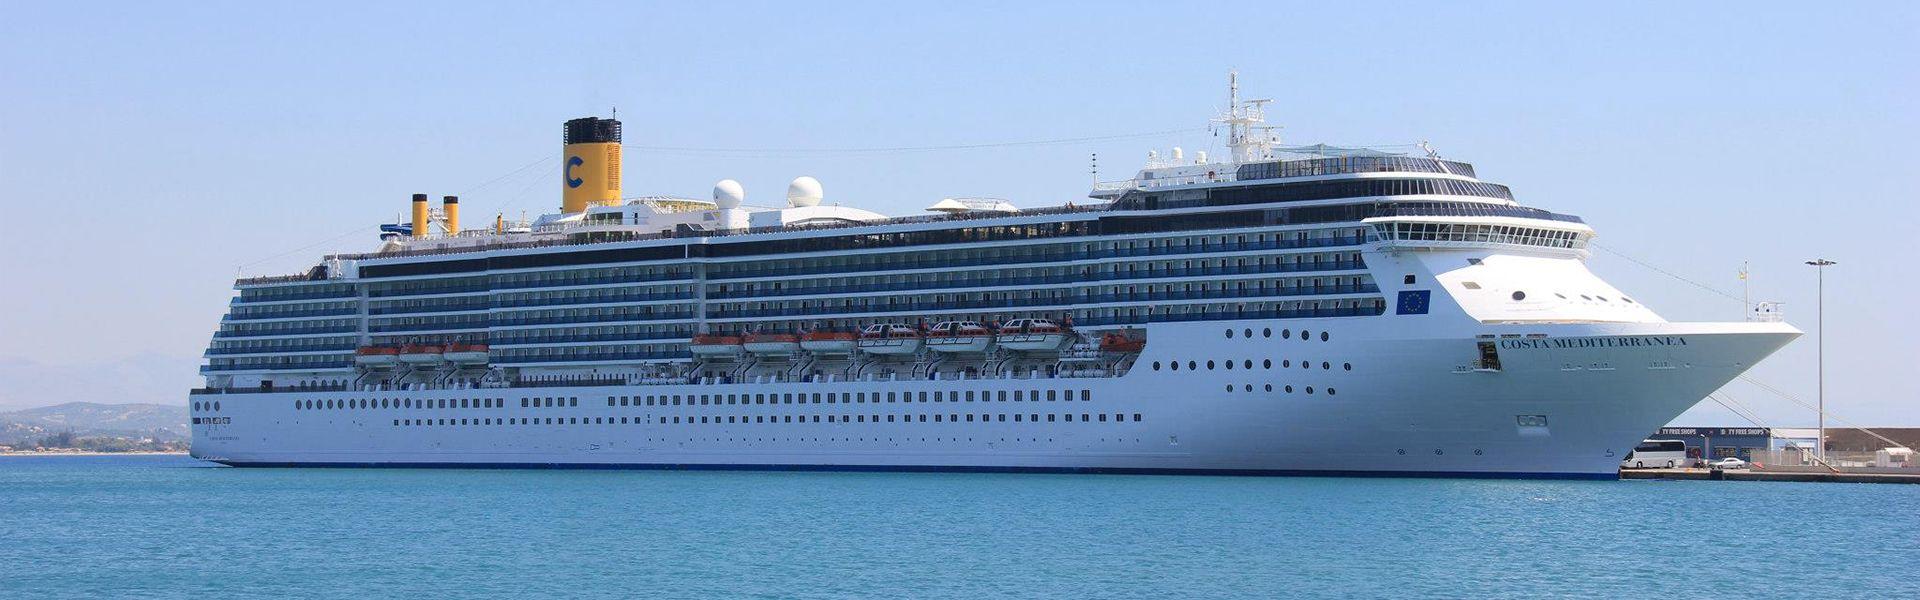 Croaziera 2017 -  Mediterana de Vest (Savona) - Costa Cruises - Costa Mediterranea - 3 nopti